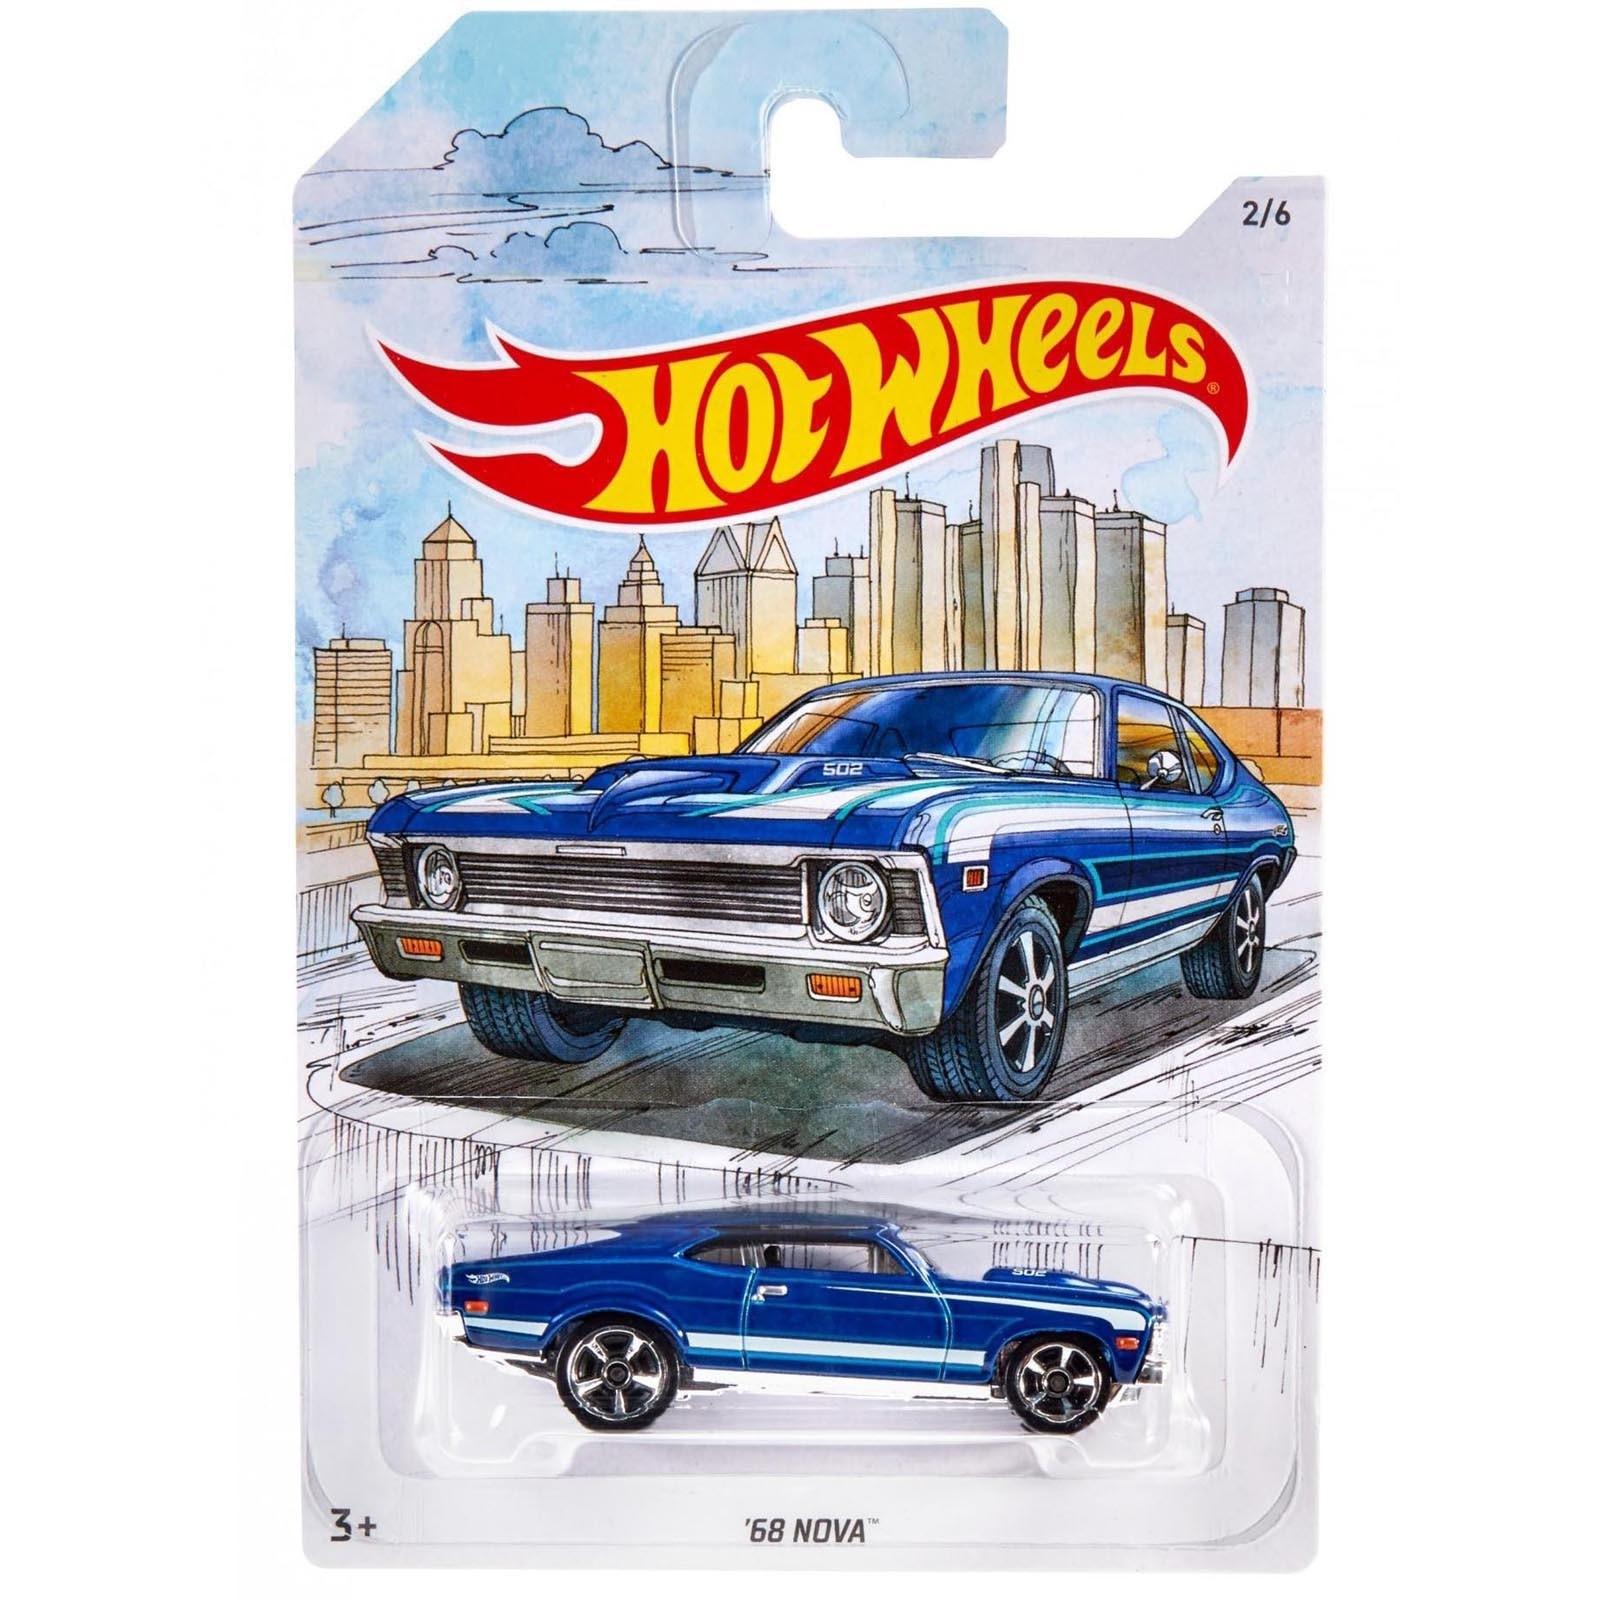 Hot Wheels - Set 6 Miniaturas - Detroit Muscle Cars - GDG44